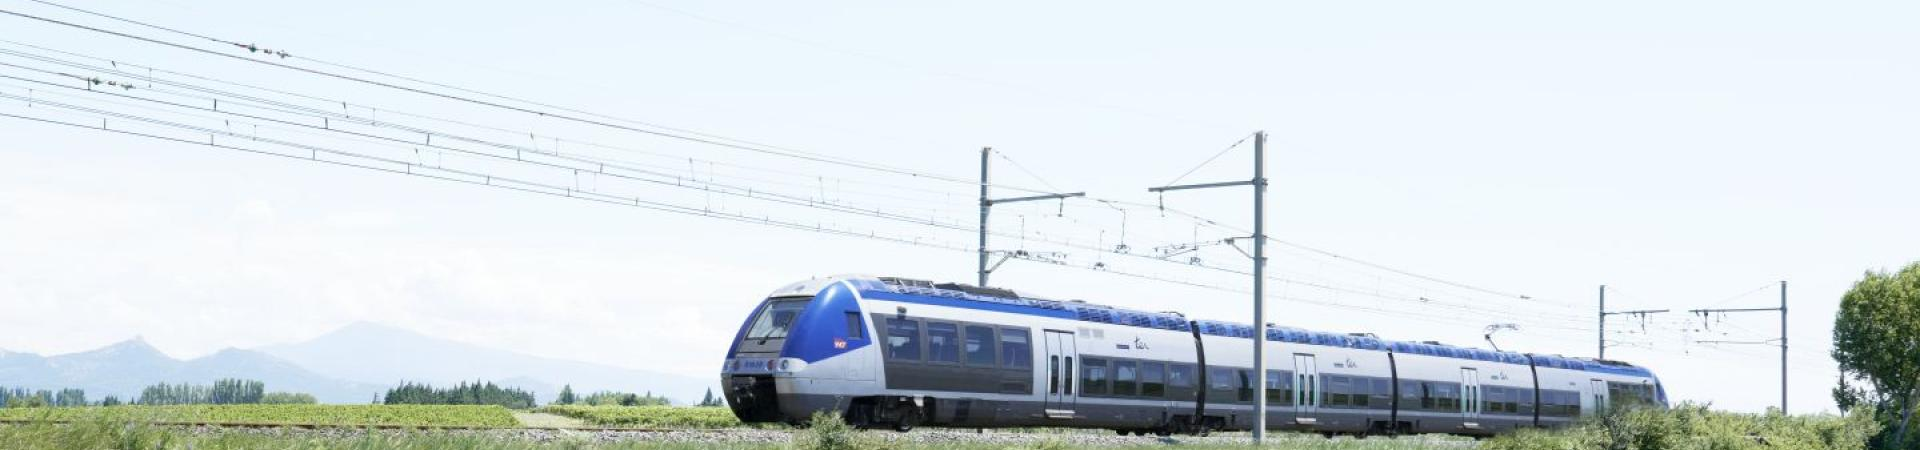 Train paysage